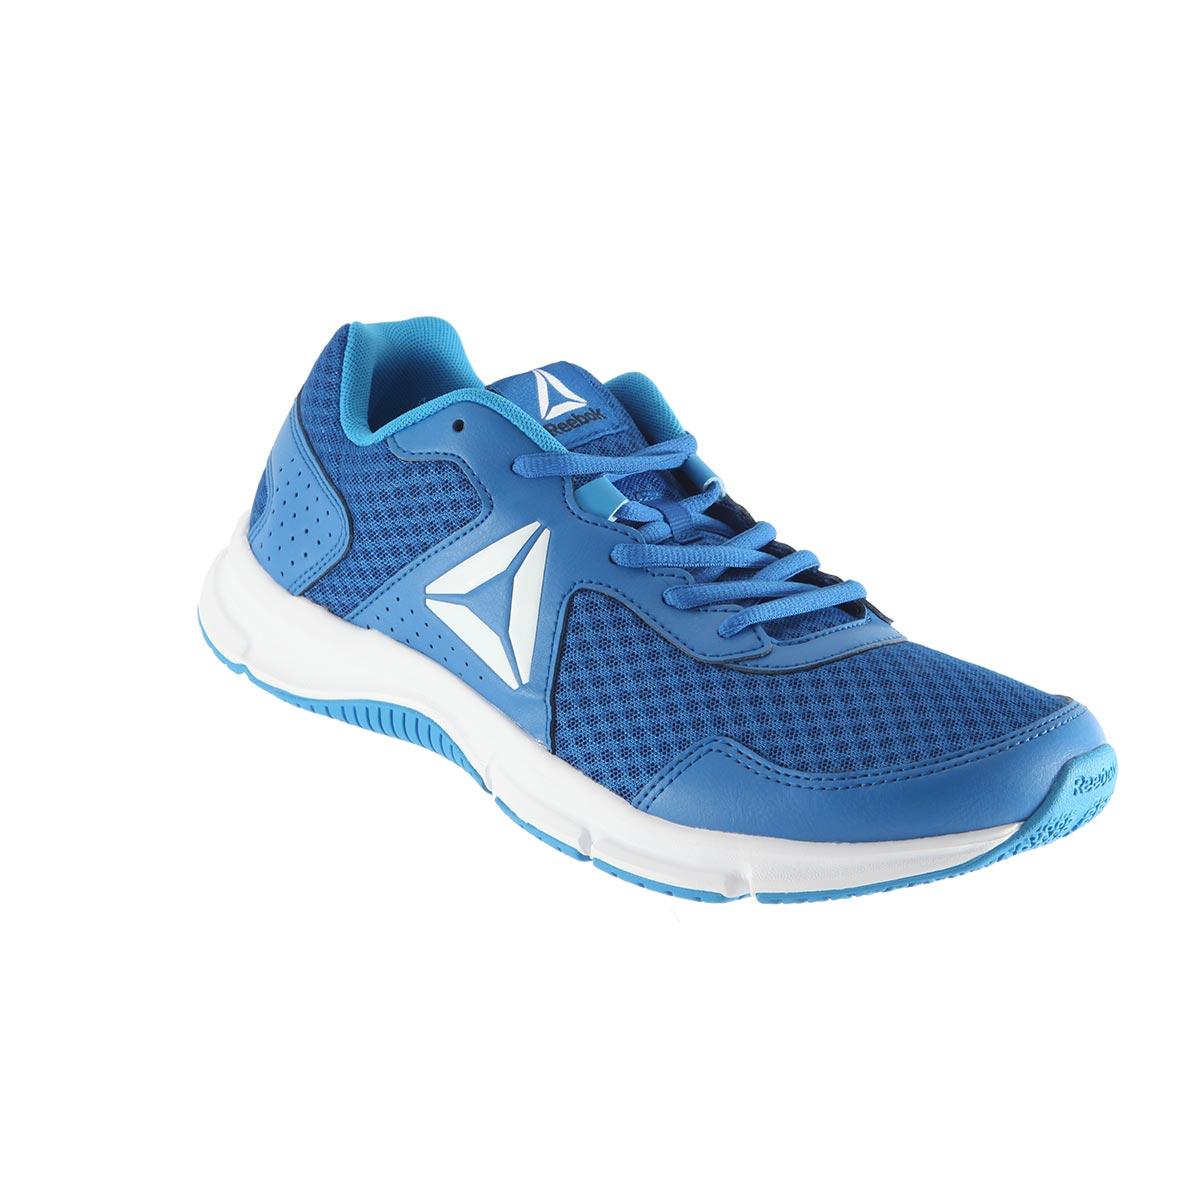 Tênis Reebok Canton Runner BD5779  - Ian Calçados